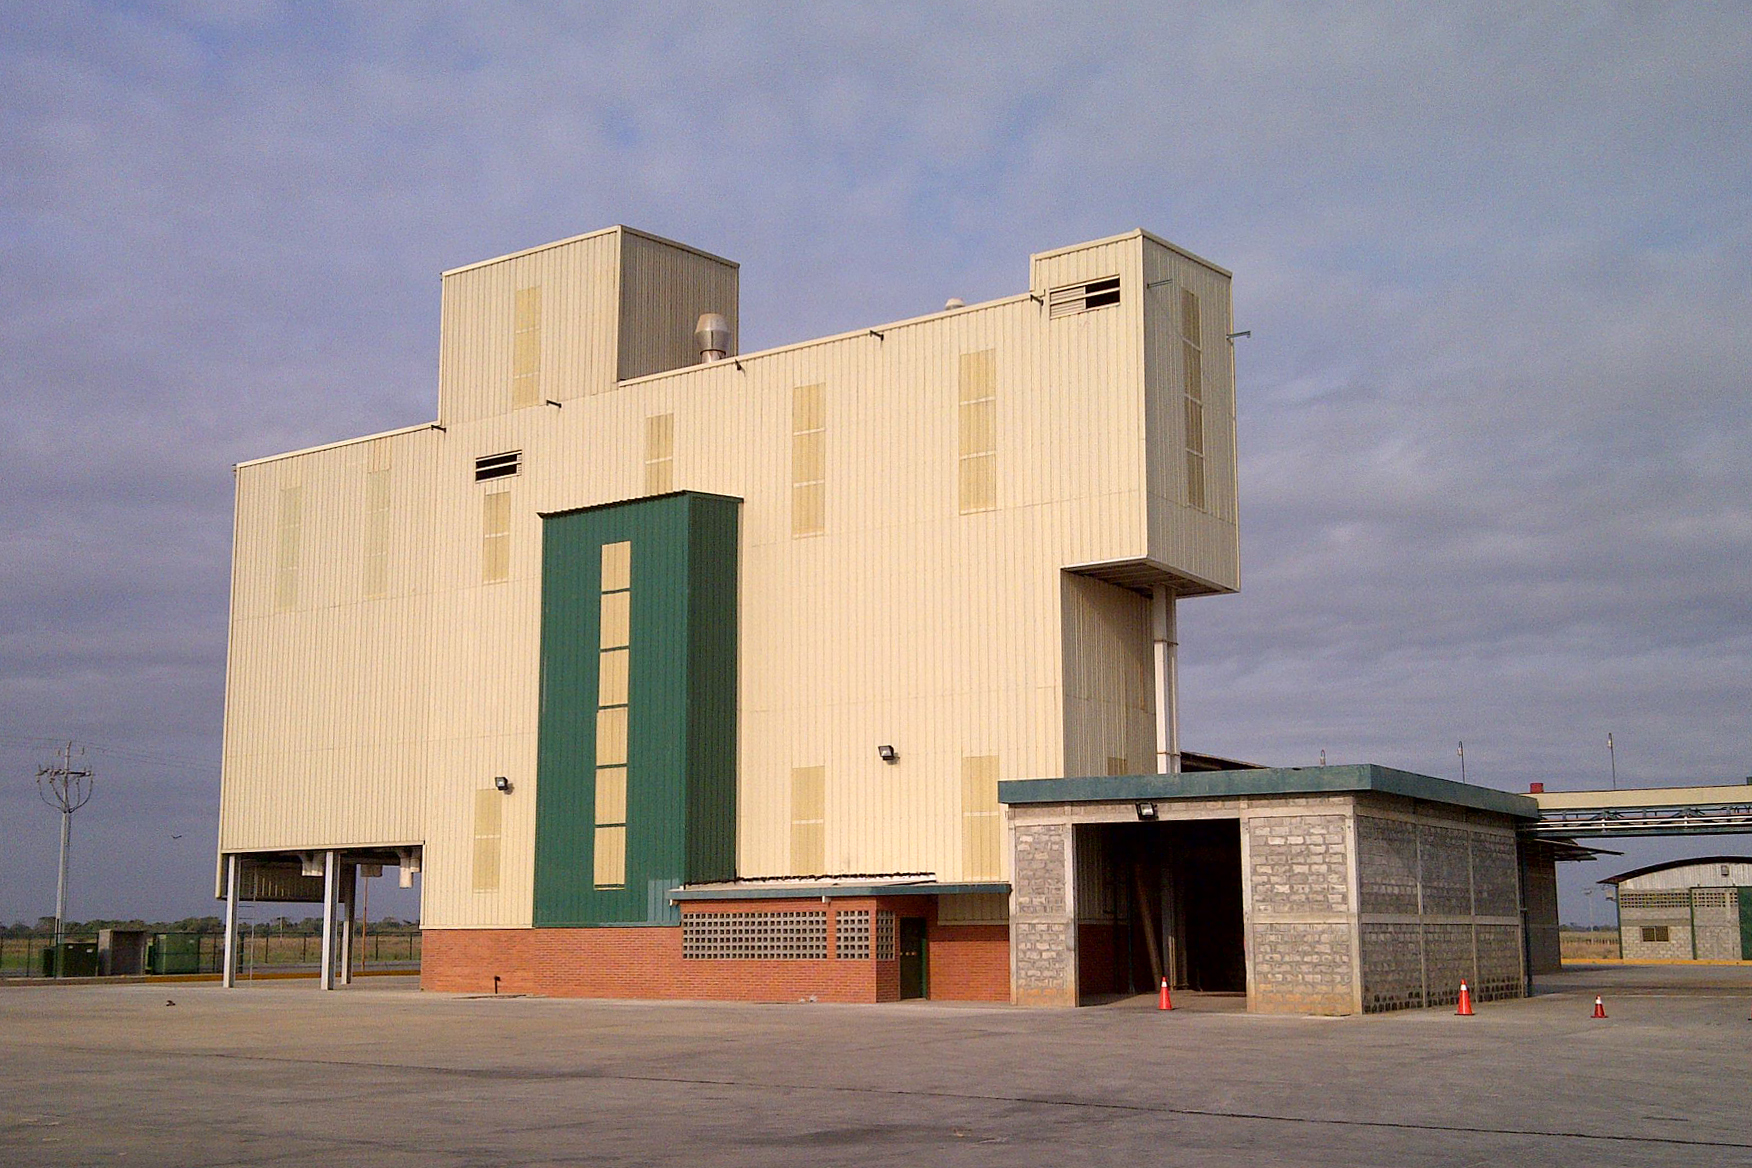 2008. Fabrica de piensos México